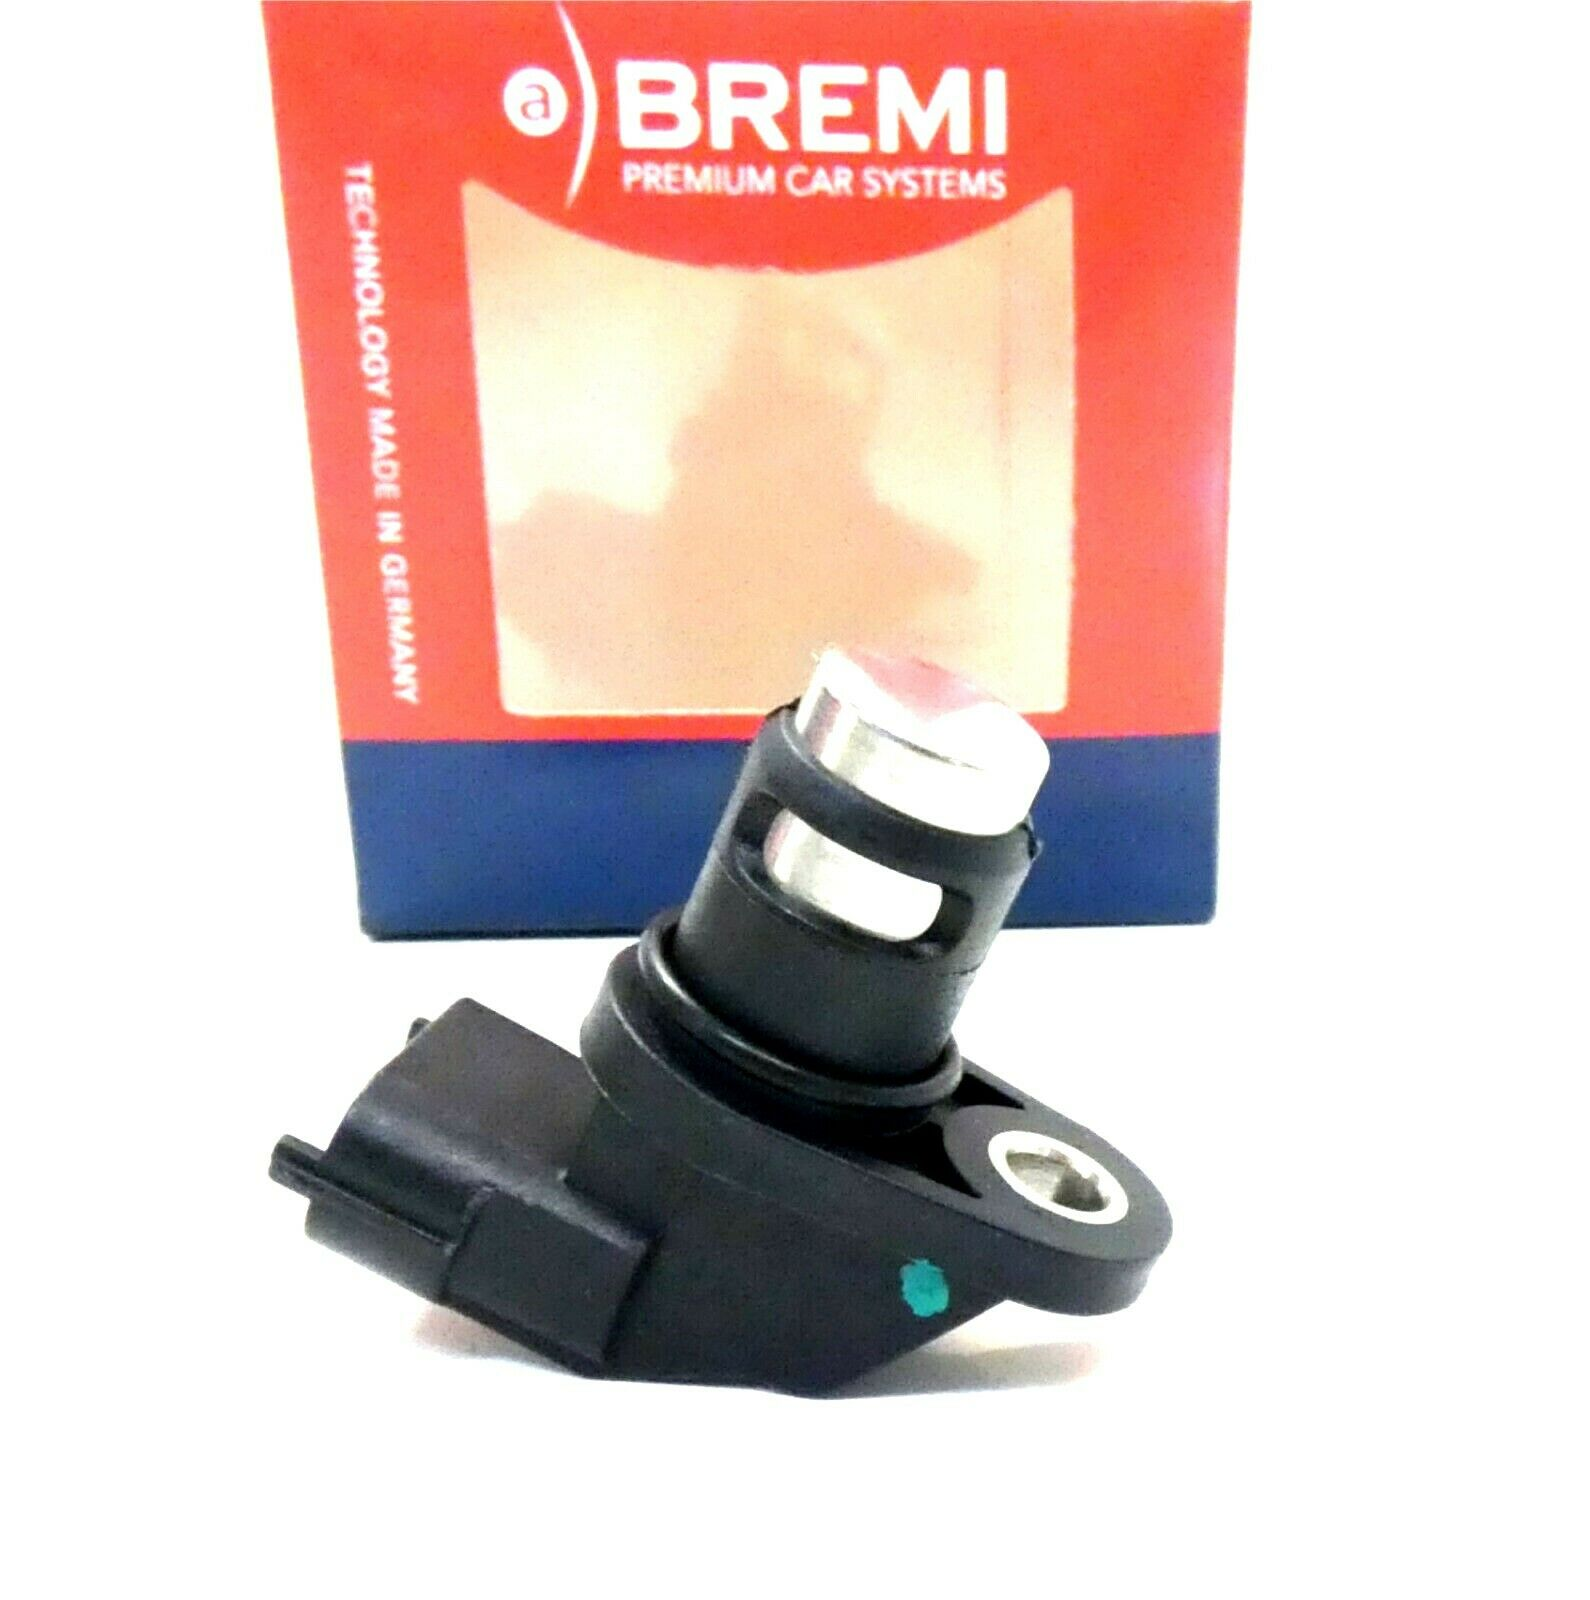 Nockenwellensensor von Bremi 3-polig OT-Geber Nockenwelle Nockenwellensensor Impulsgeber Sensor Gemischaufbereitung Impulsgeber 60100